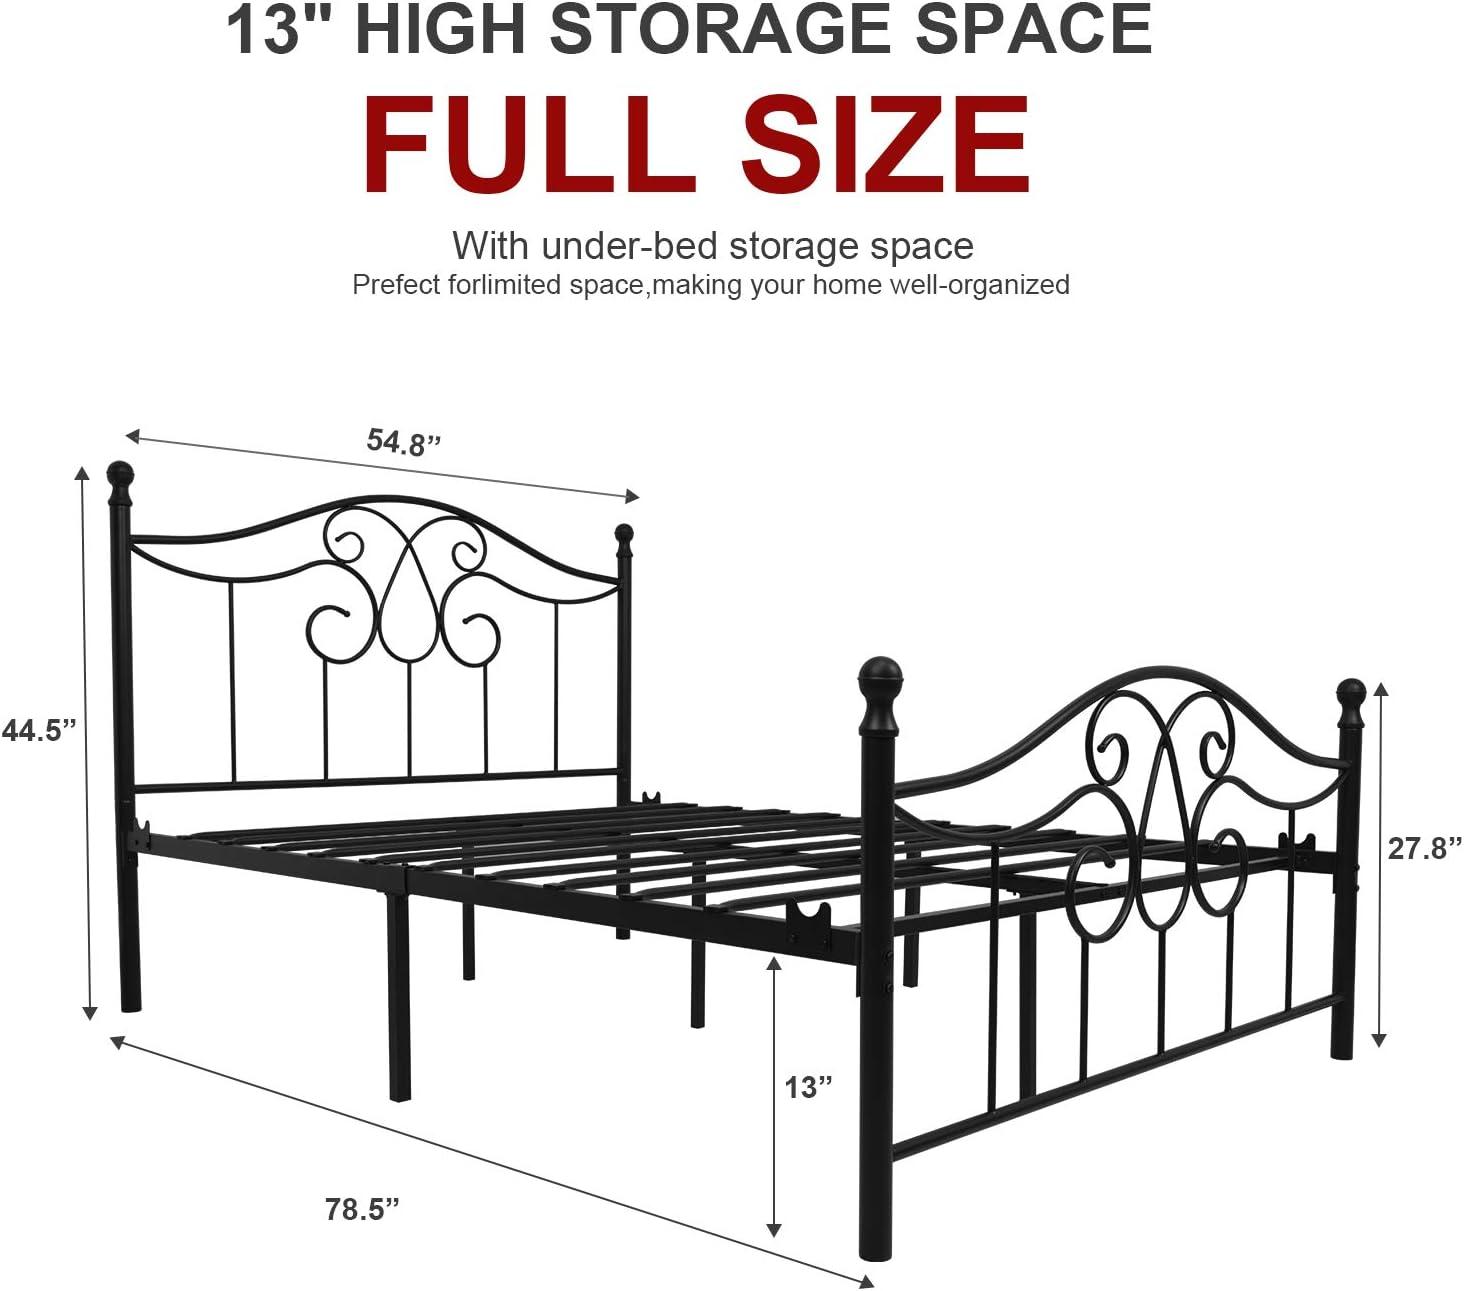 Vintage Sturdy Metal Bed Frame Full Size with Vintage Headboard and Footboard Platform Base Bed Frame No Box Spring Needed Steel Bed?Antique Brown?Full.